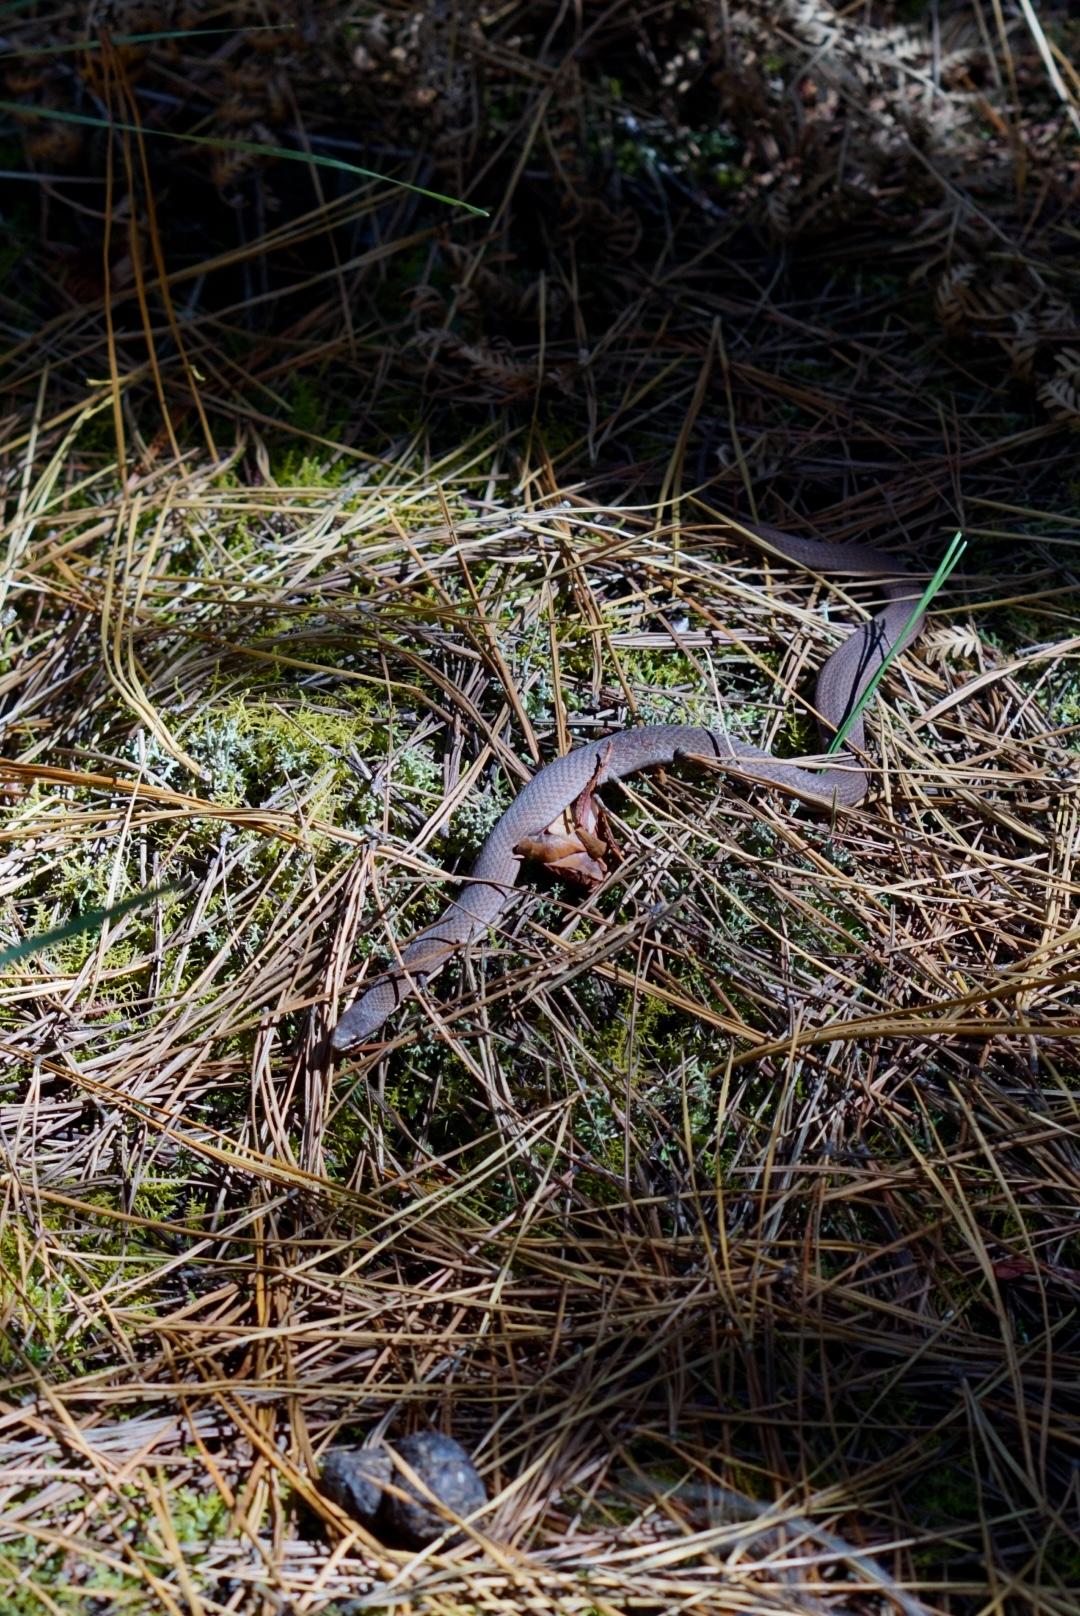 NatashaMorgan_forest_snake.jpg